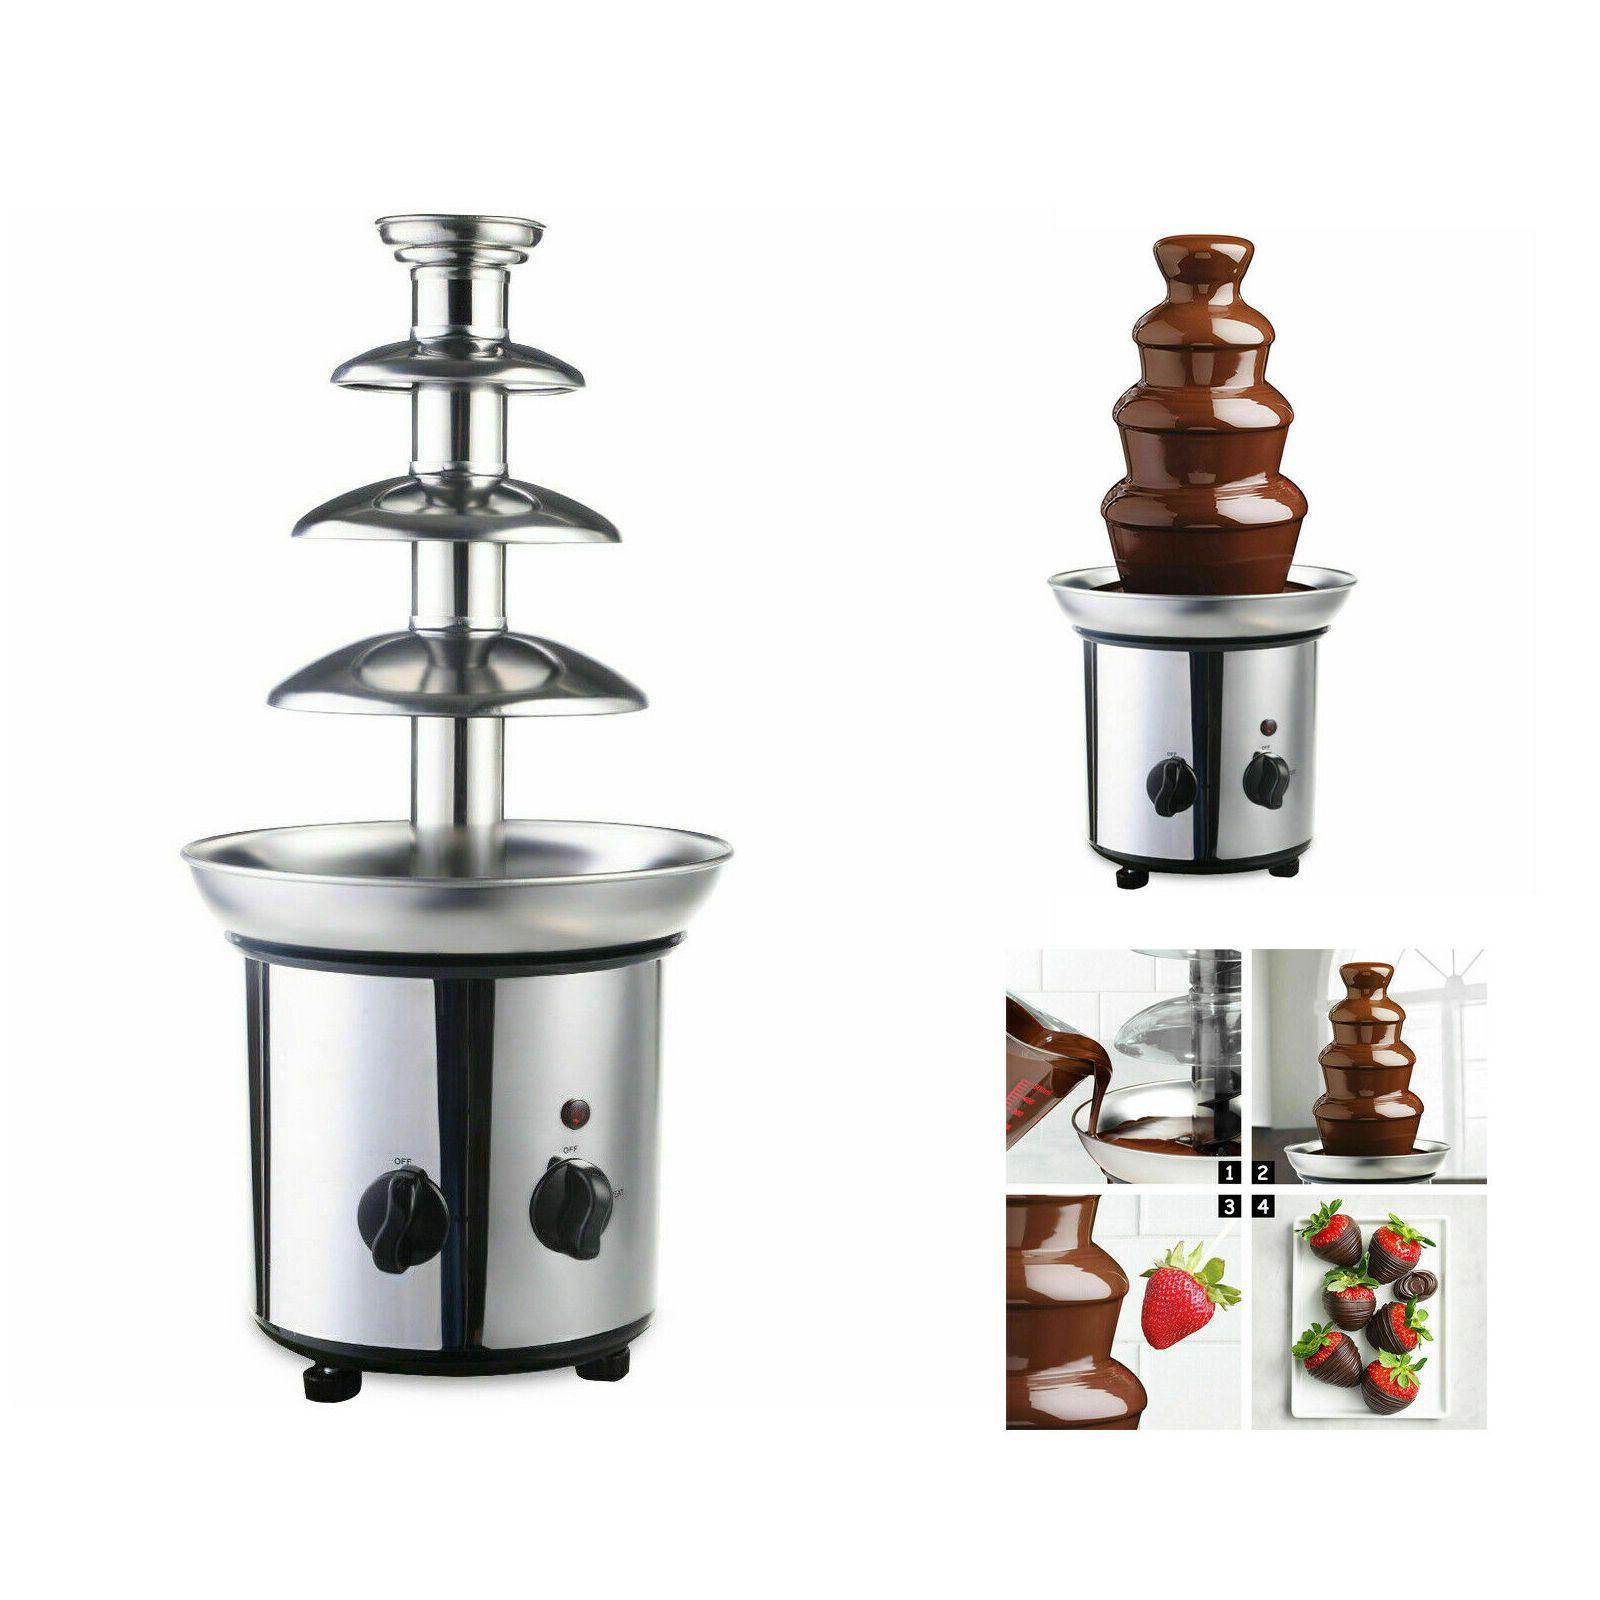 Commerciale Acciaio inox lusso partito Hot Chocolate Fondue Fontana 4 Tier US